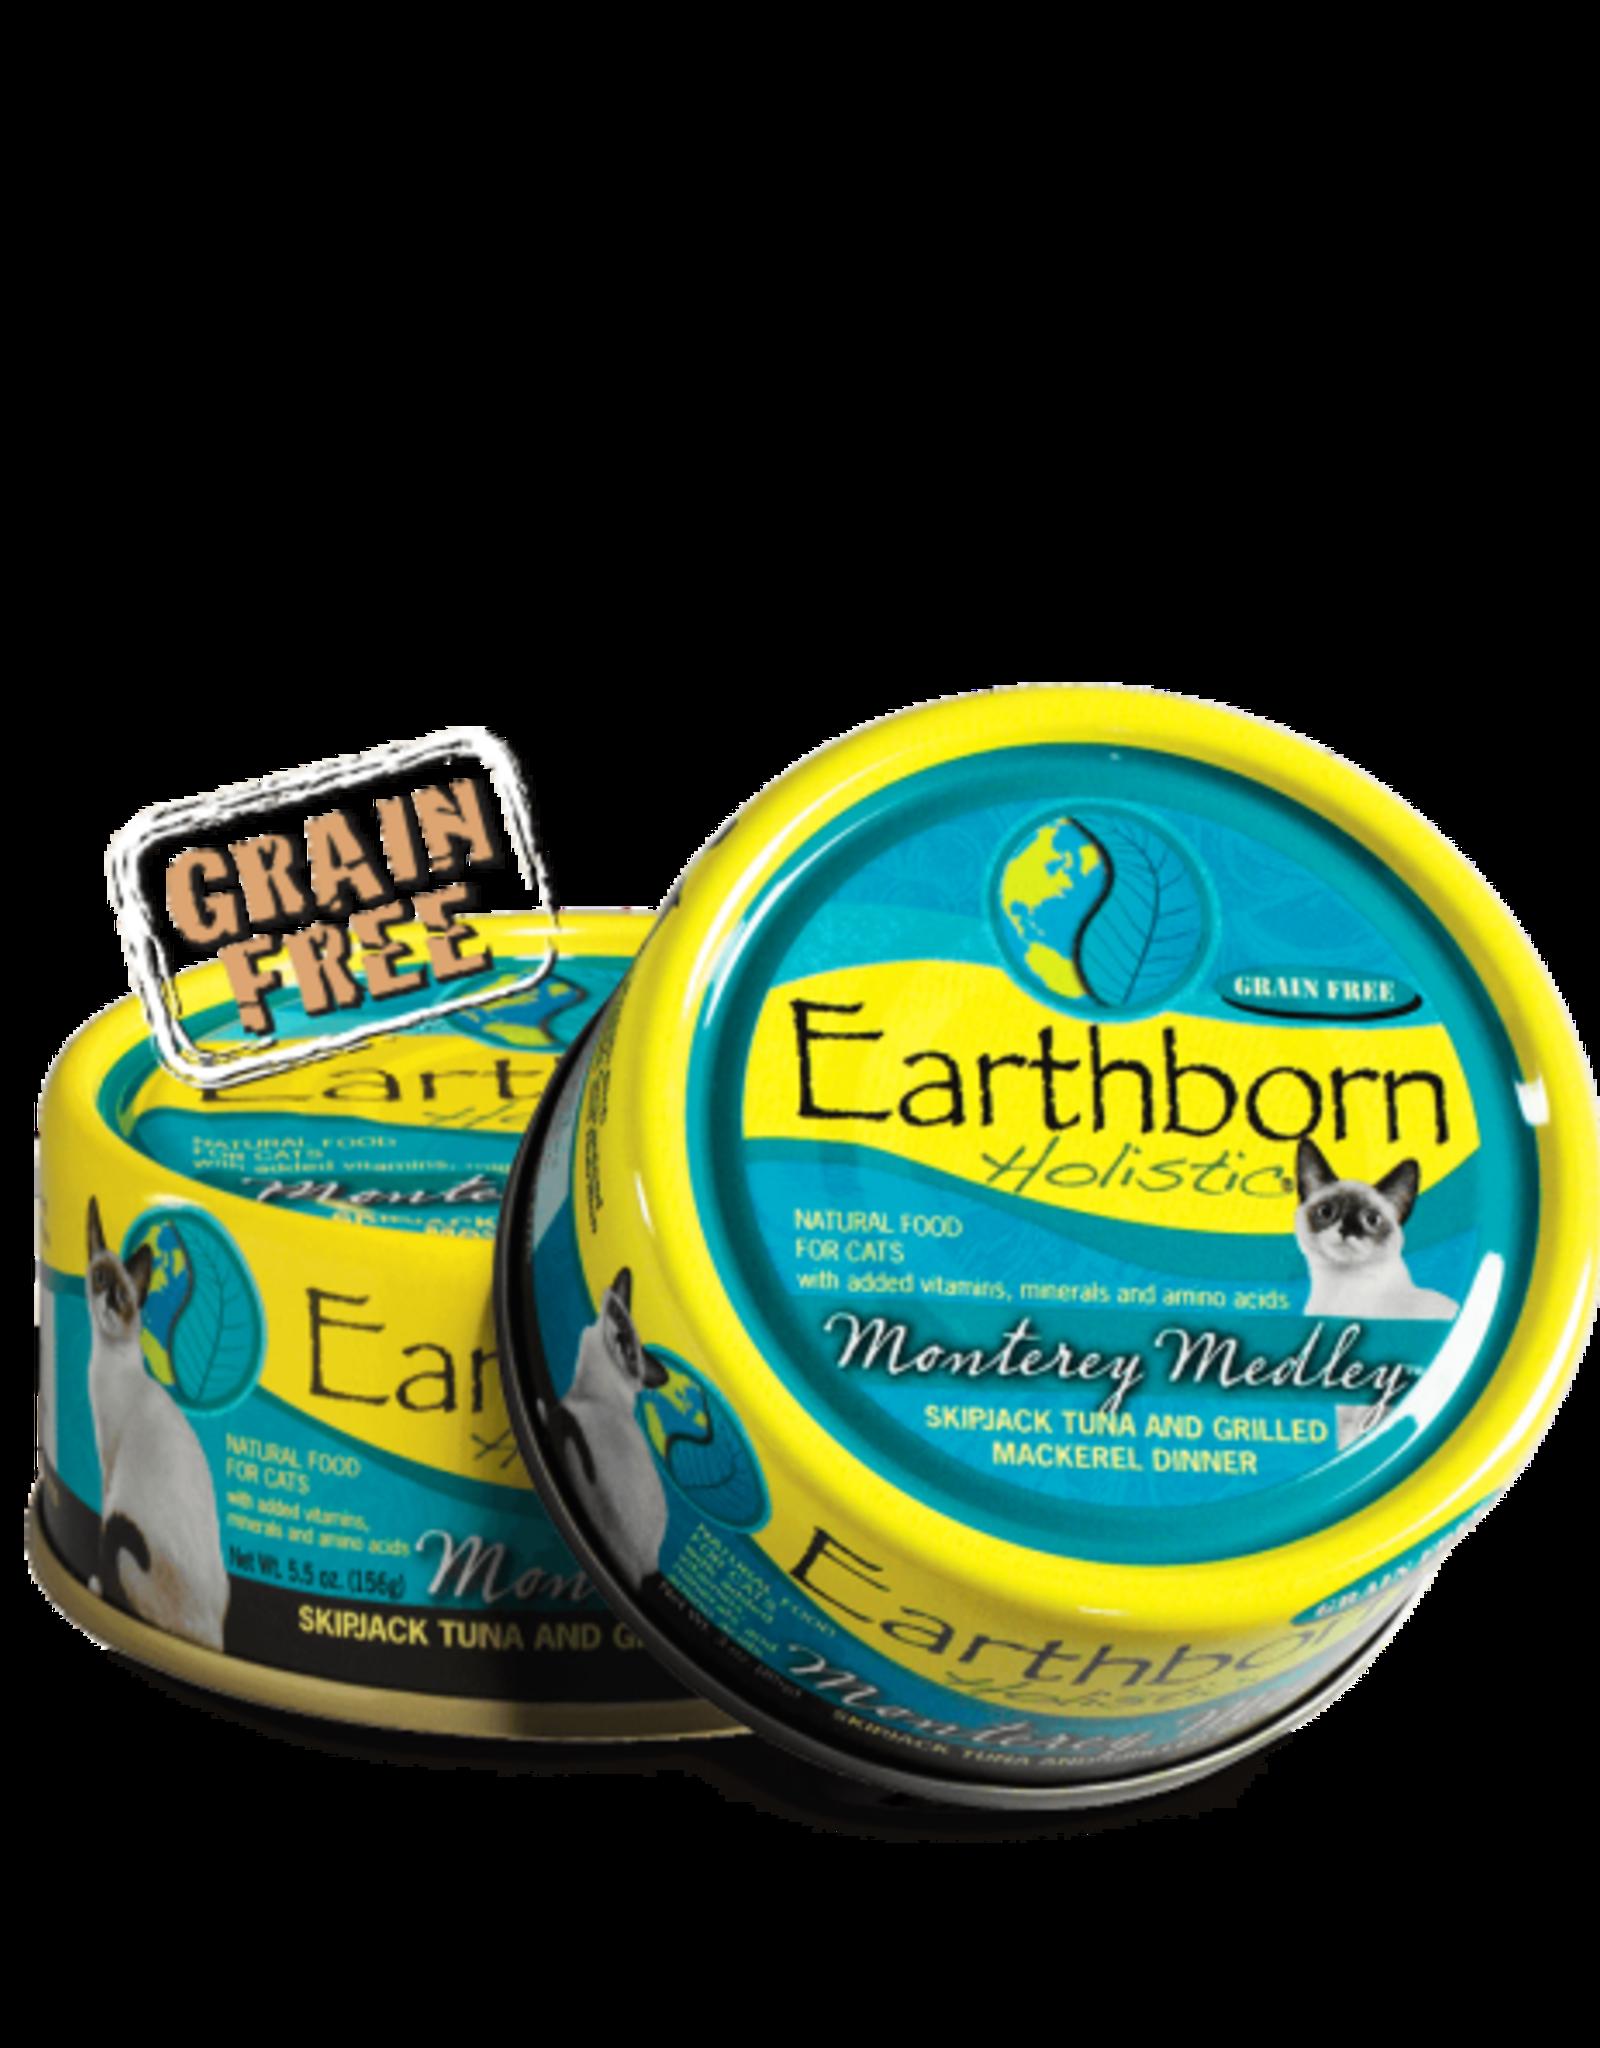 Earthborn Holistic Cat Monterey Medley Shredded - Grain-Free 3oz